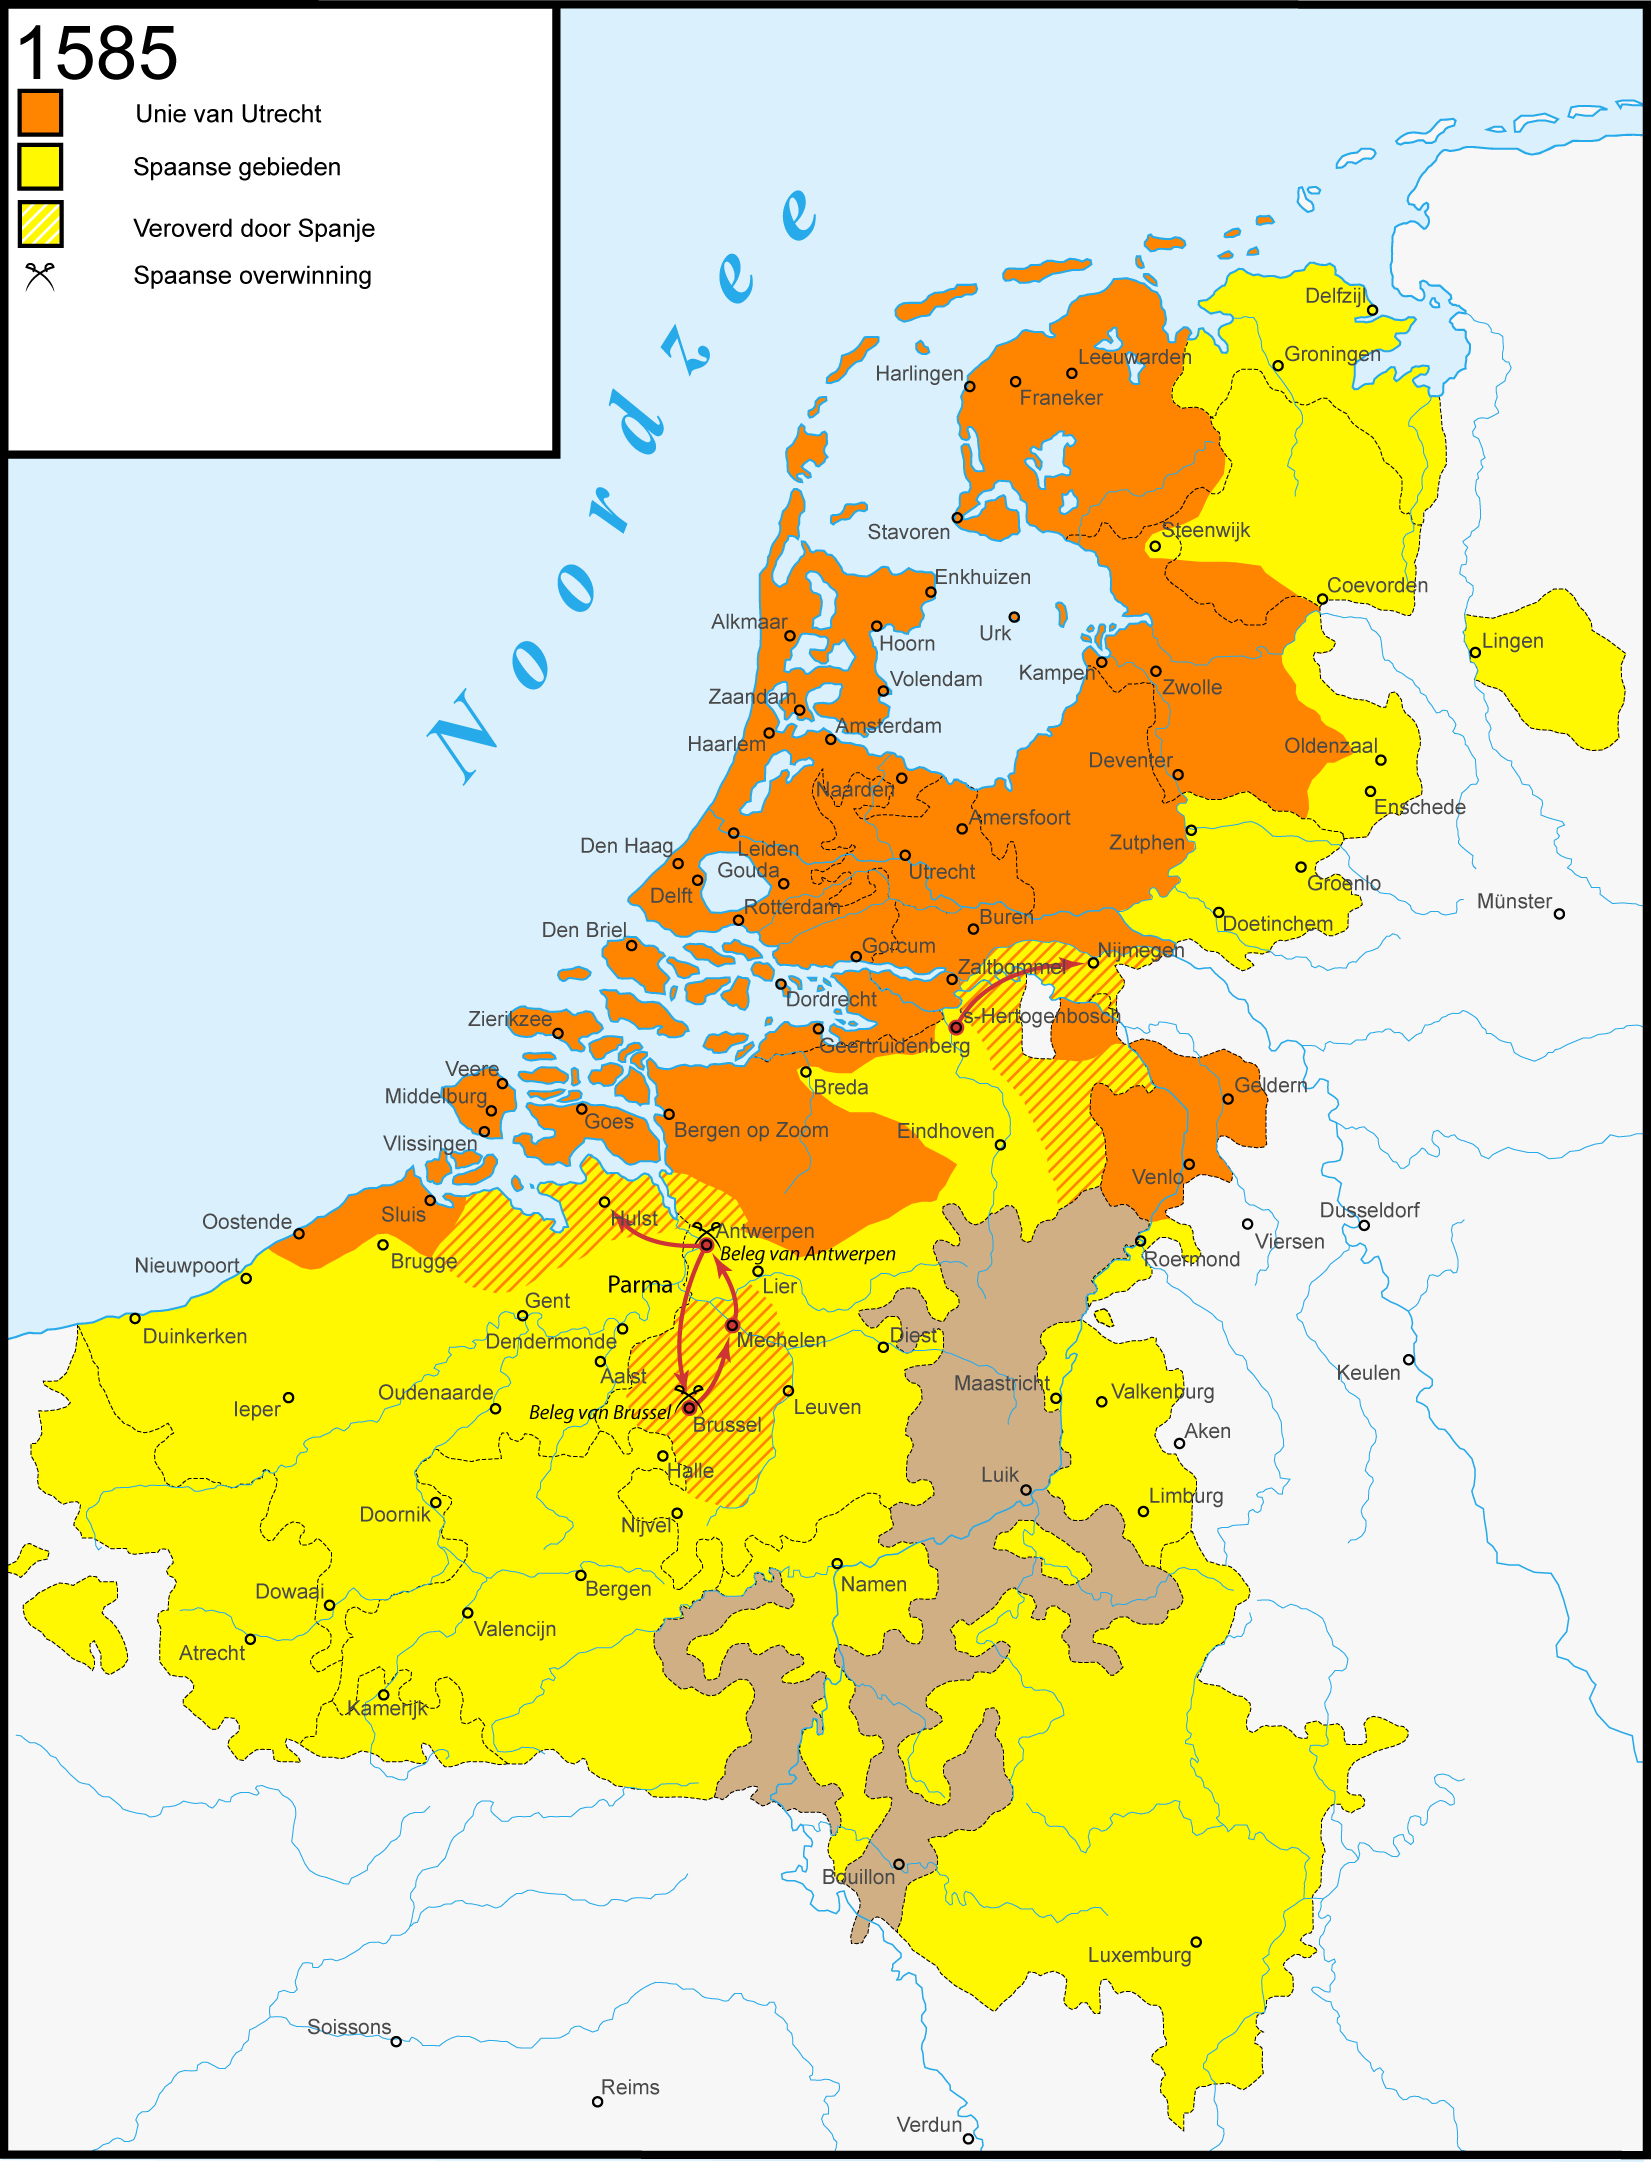 File:Tachtigjarigeoorlog-1585.png